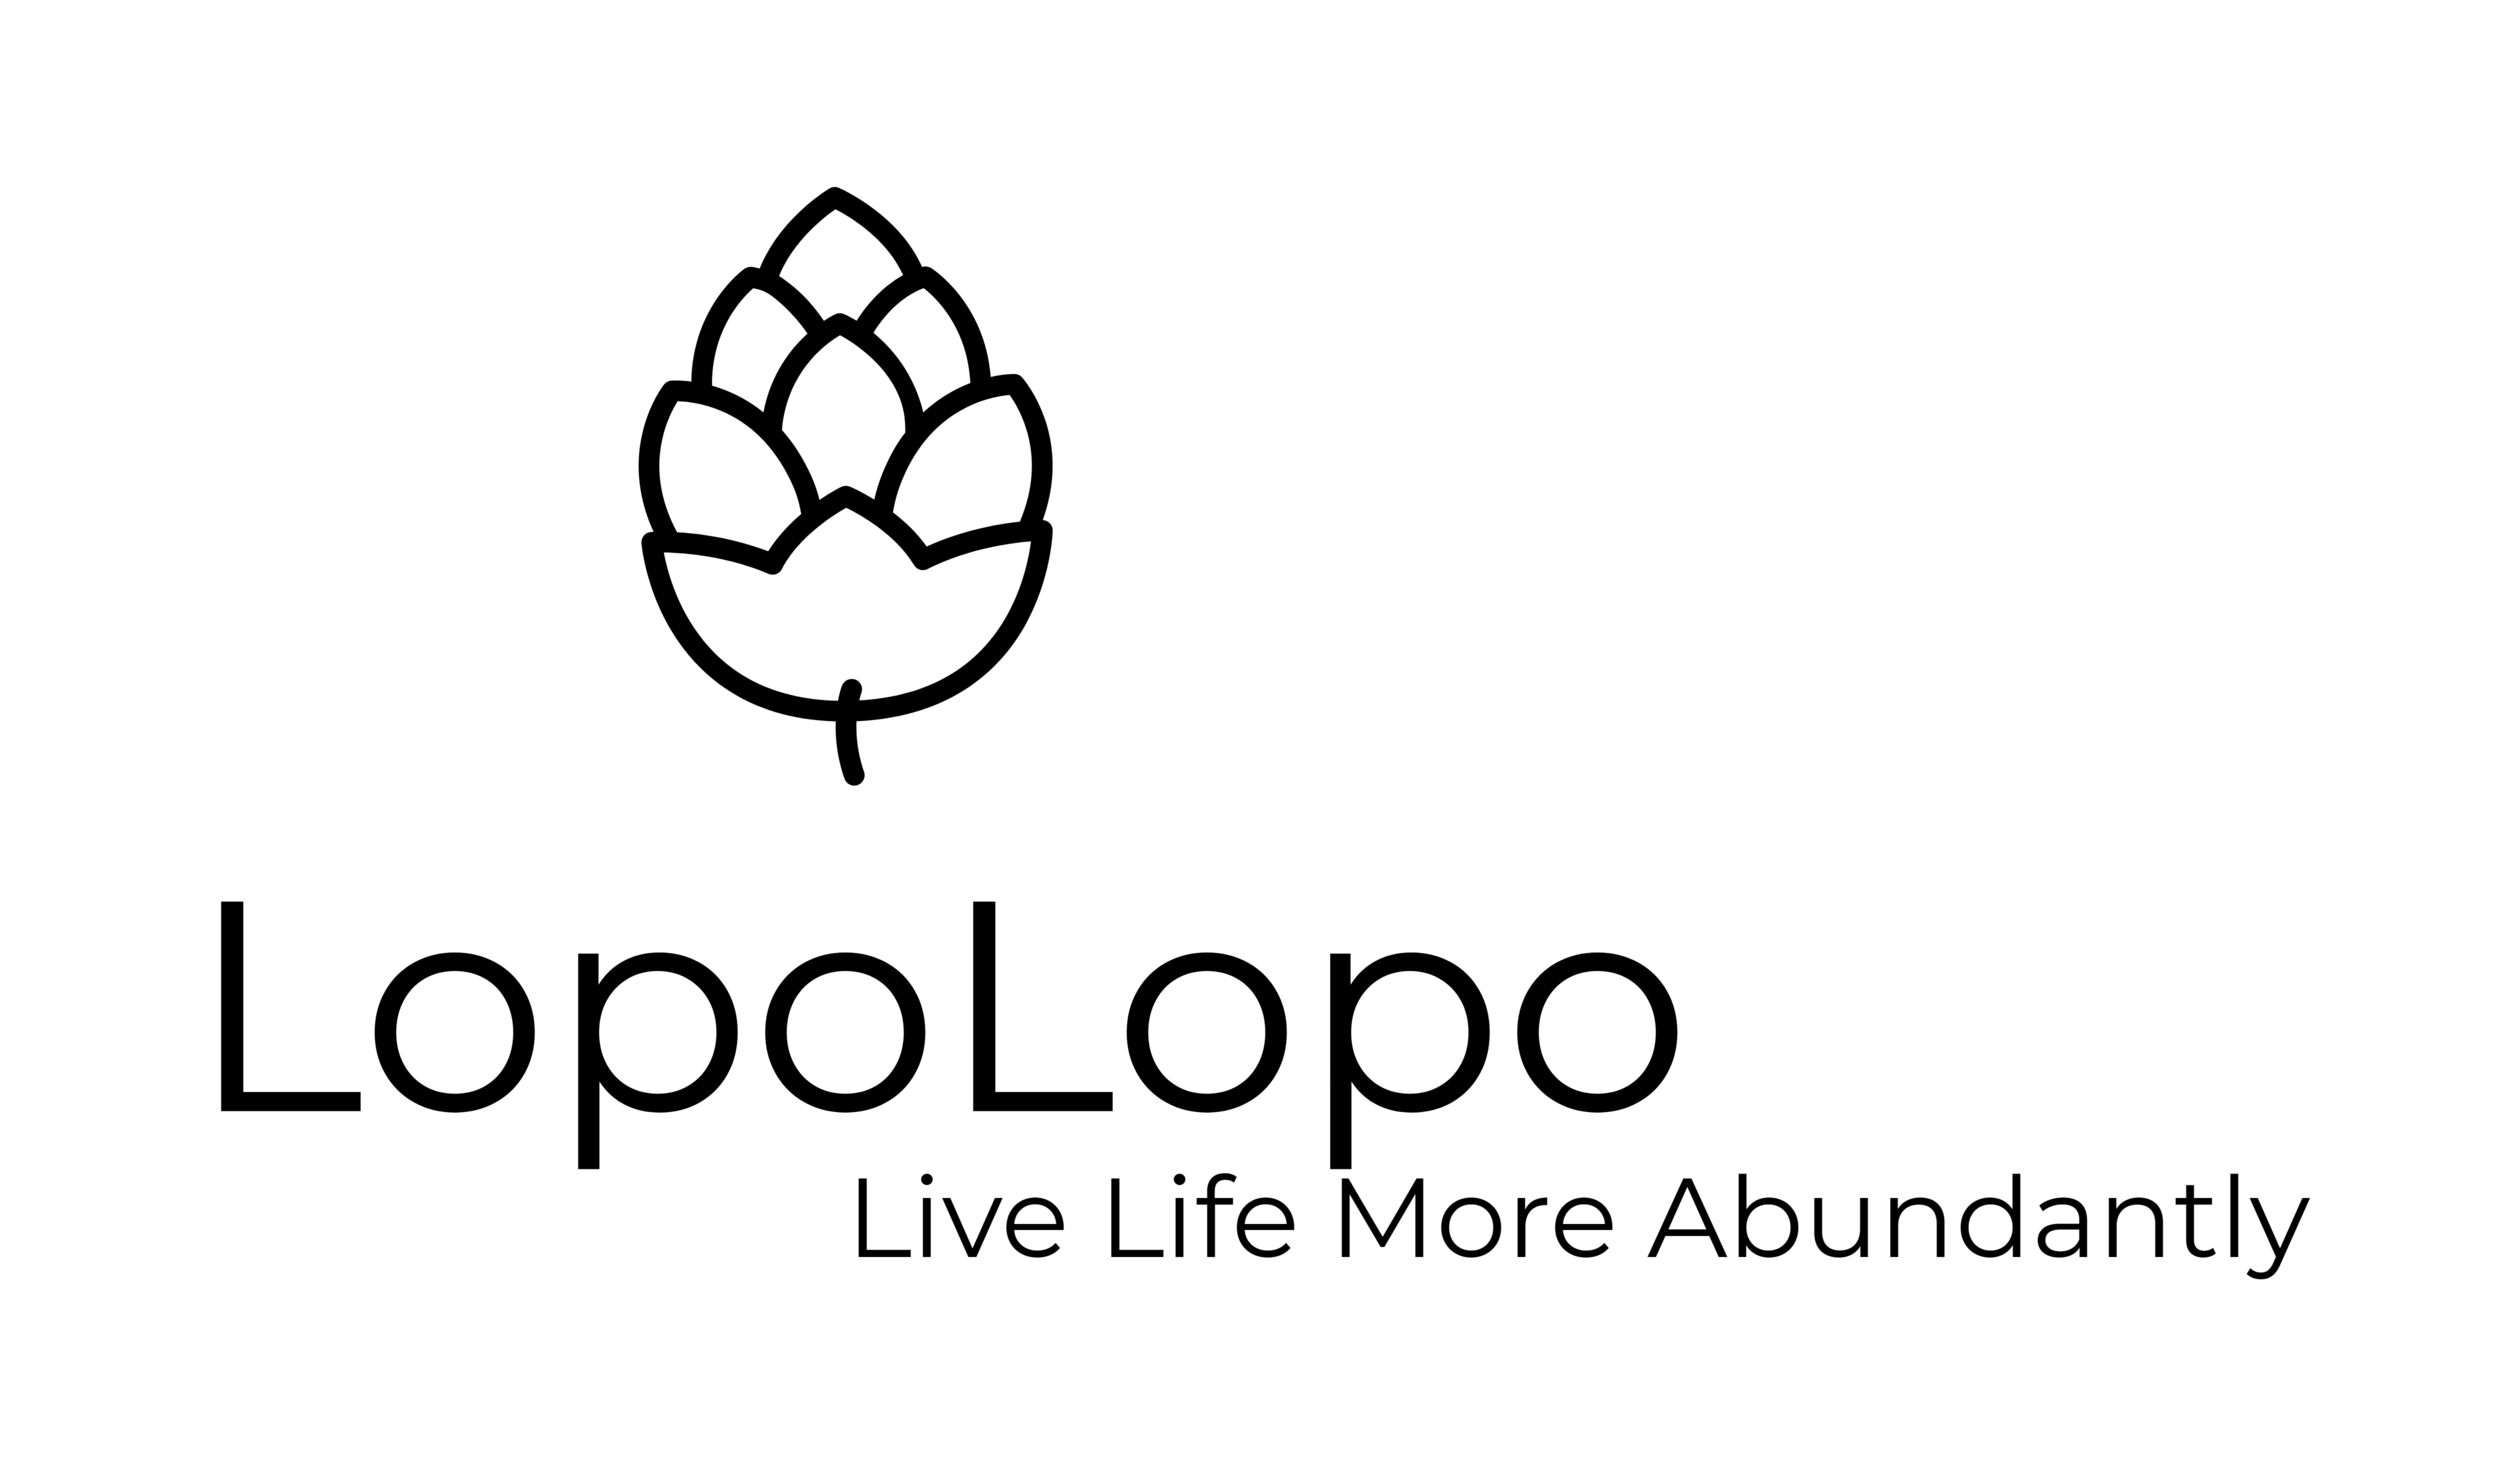 LopoLopo-logo-pinecone-black.png